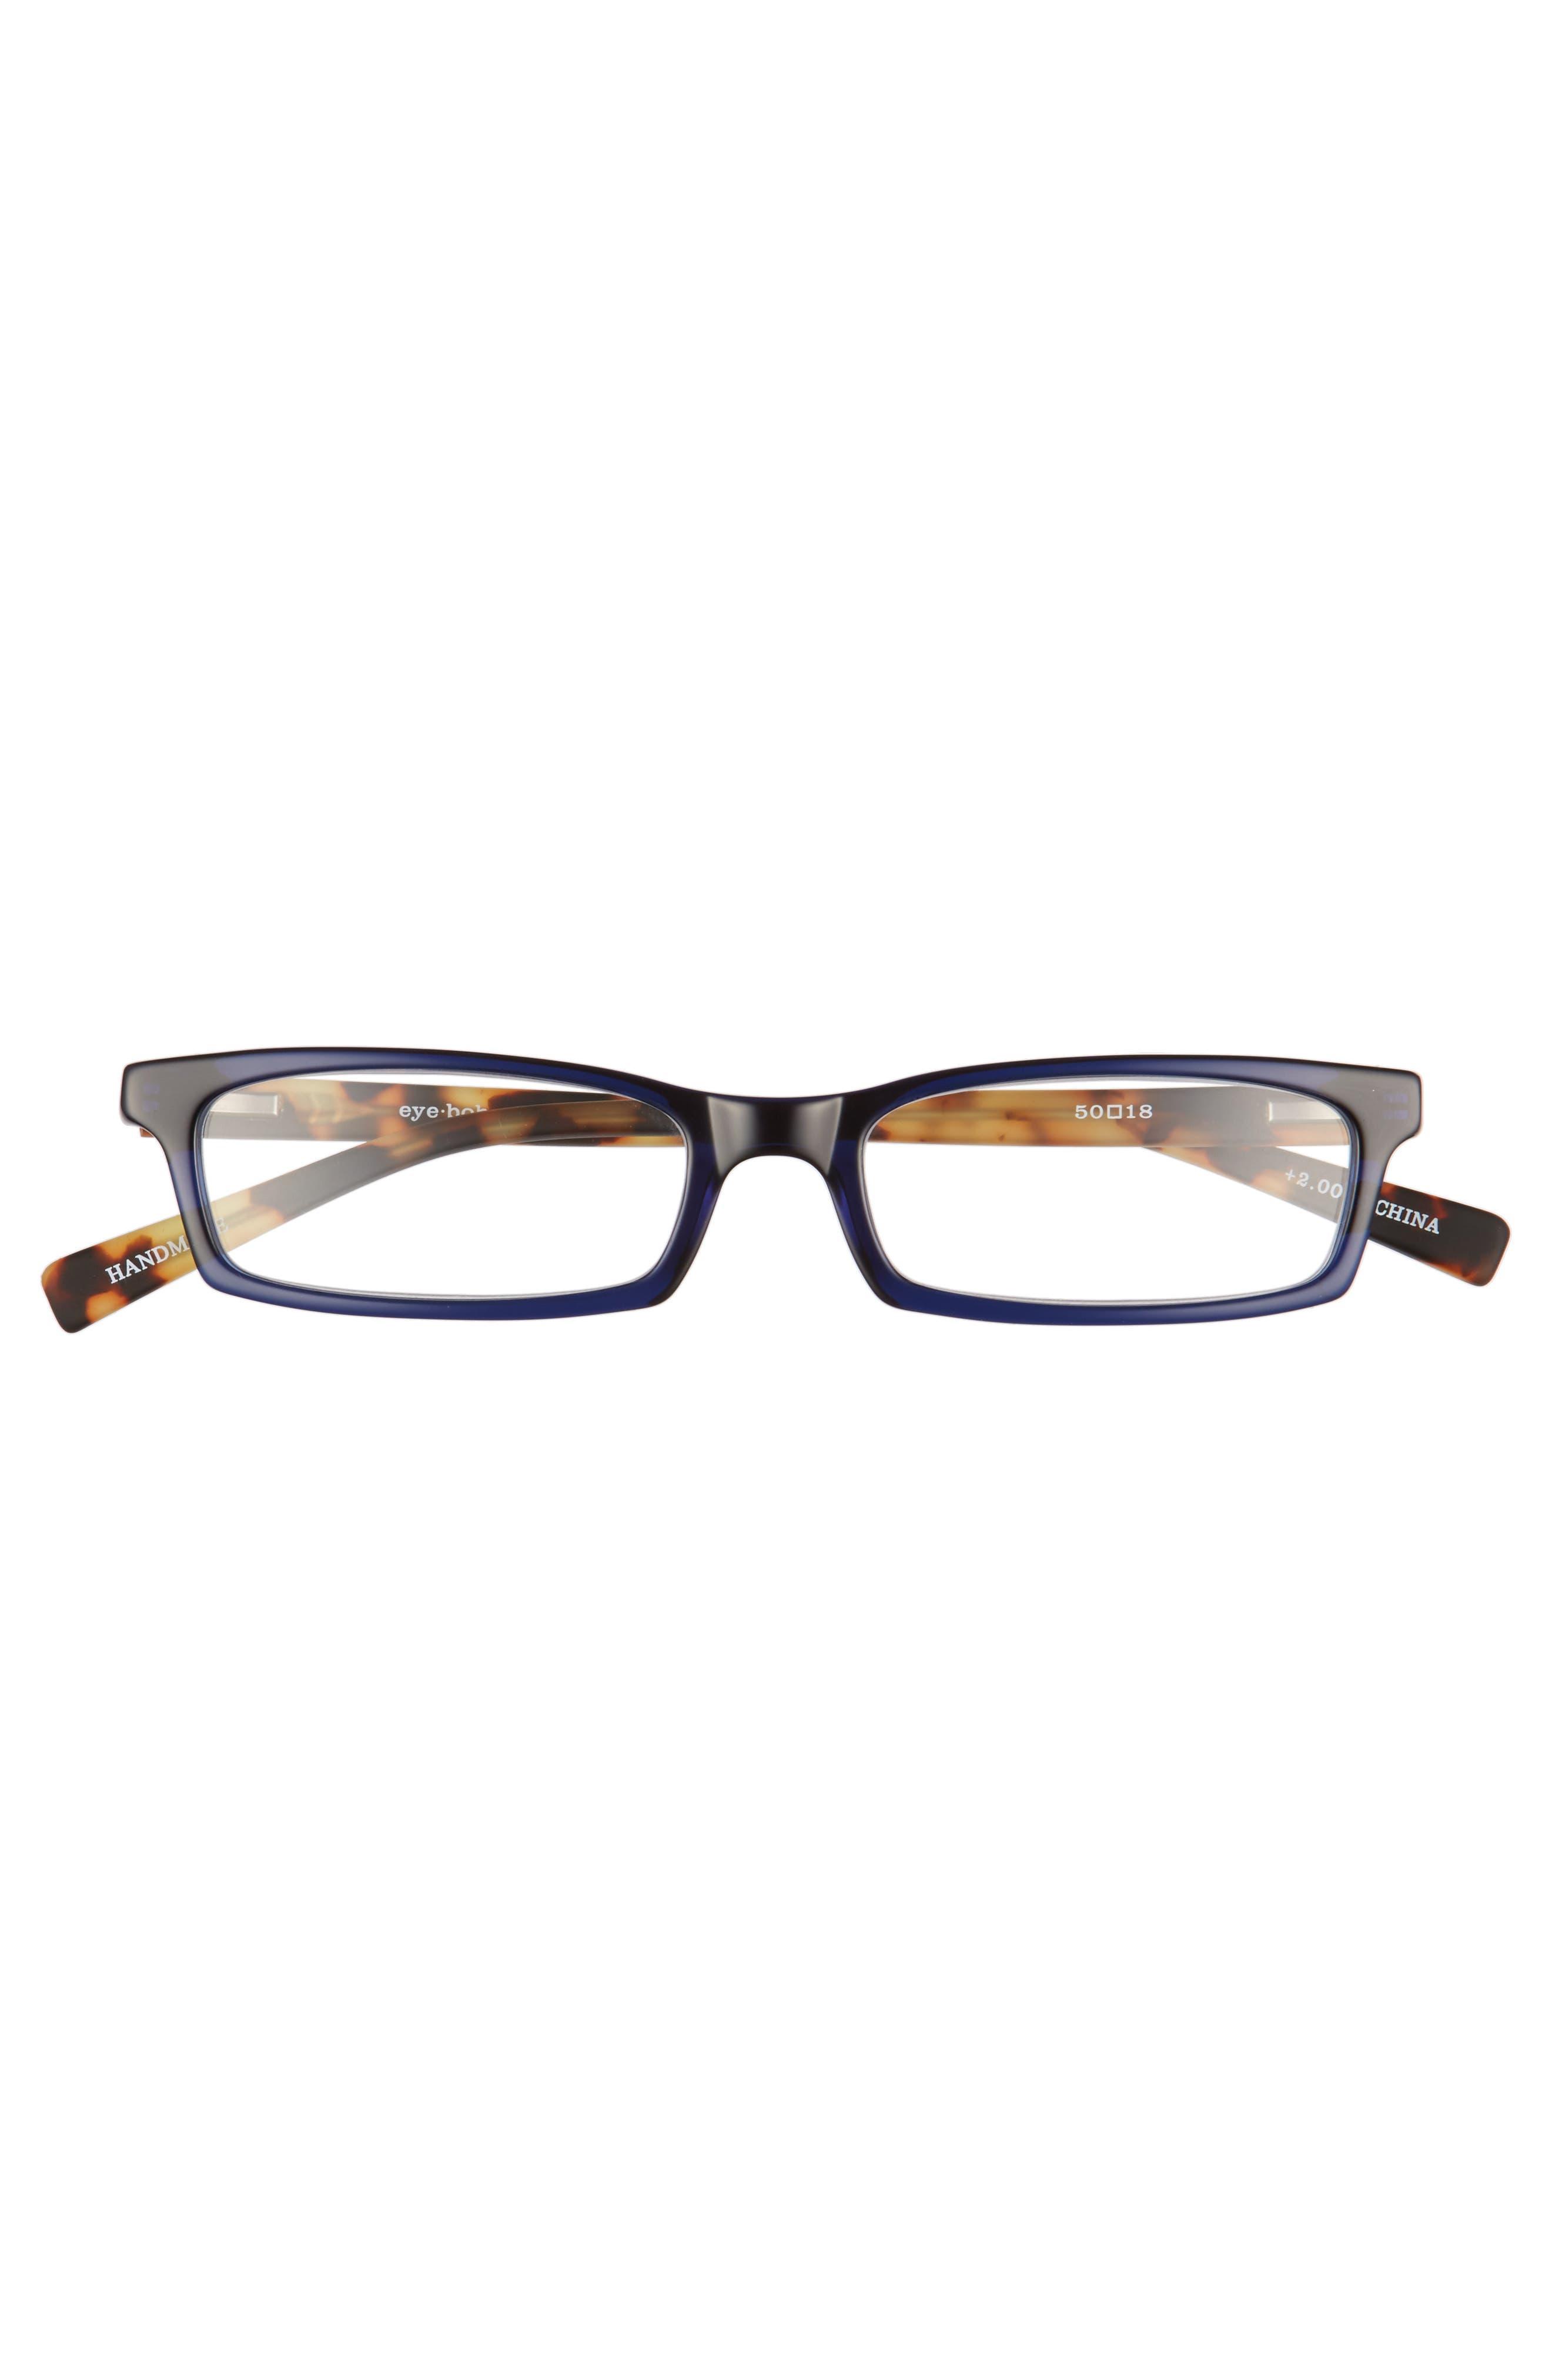 Man Power 50mm Reading Glasses,                             Alternate thumbnail 2, color,                             NAVY WITH TORTOISE